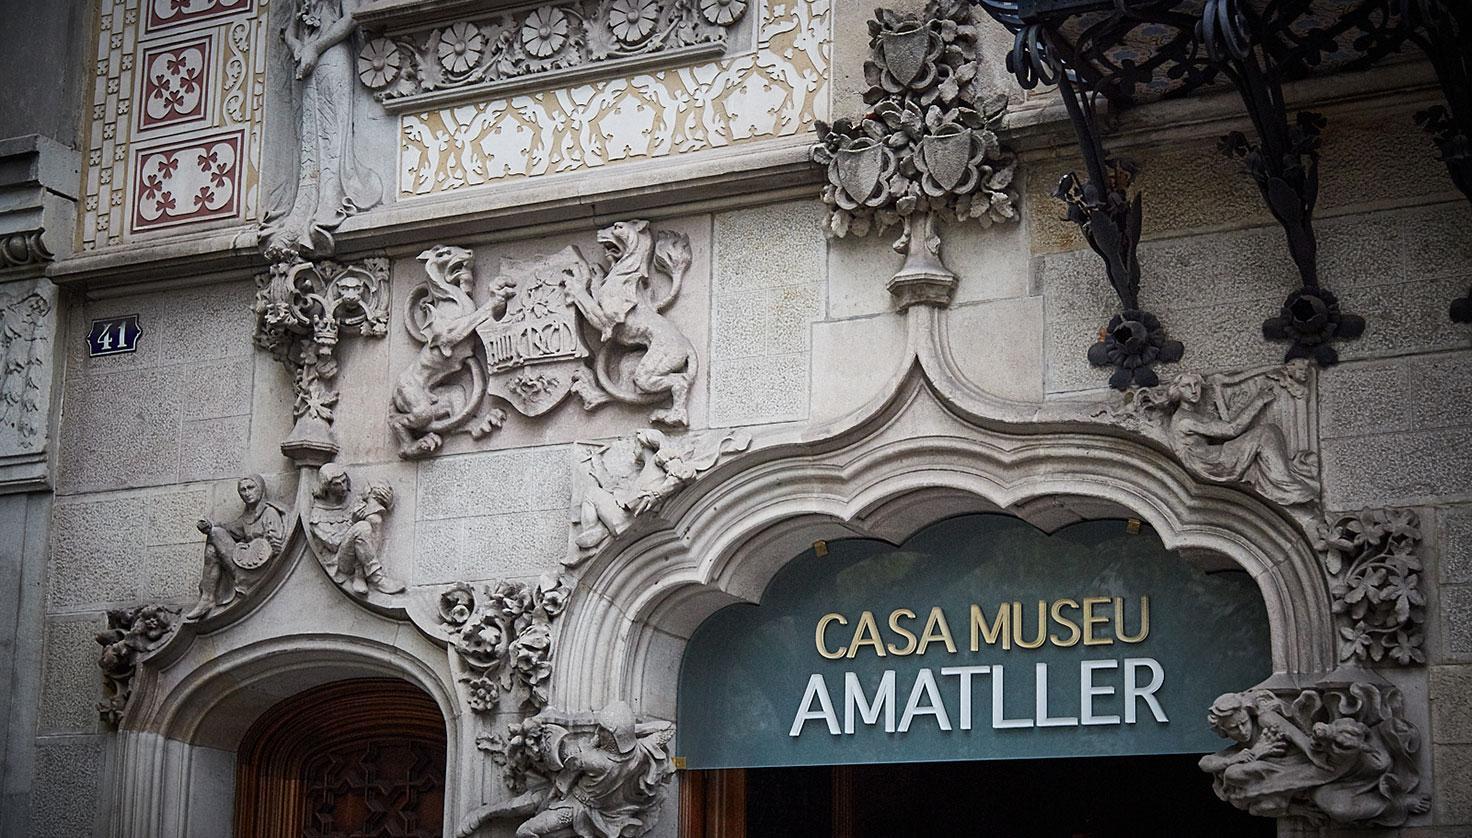 Photo Casa Amatller Josep Puig i Cadafalch